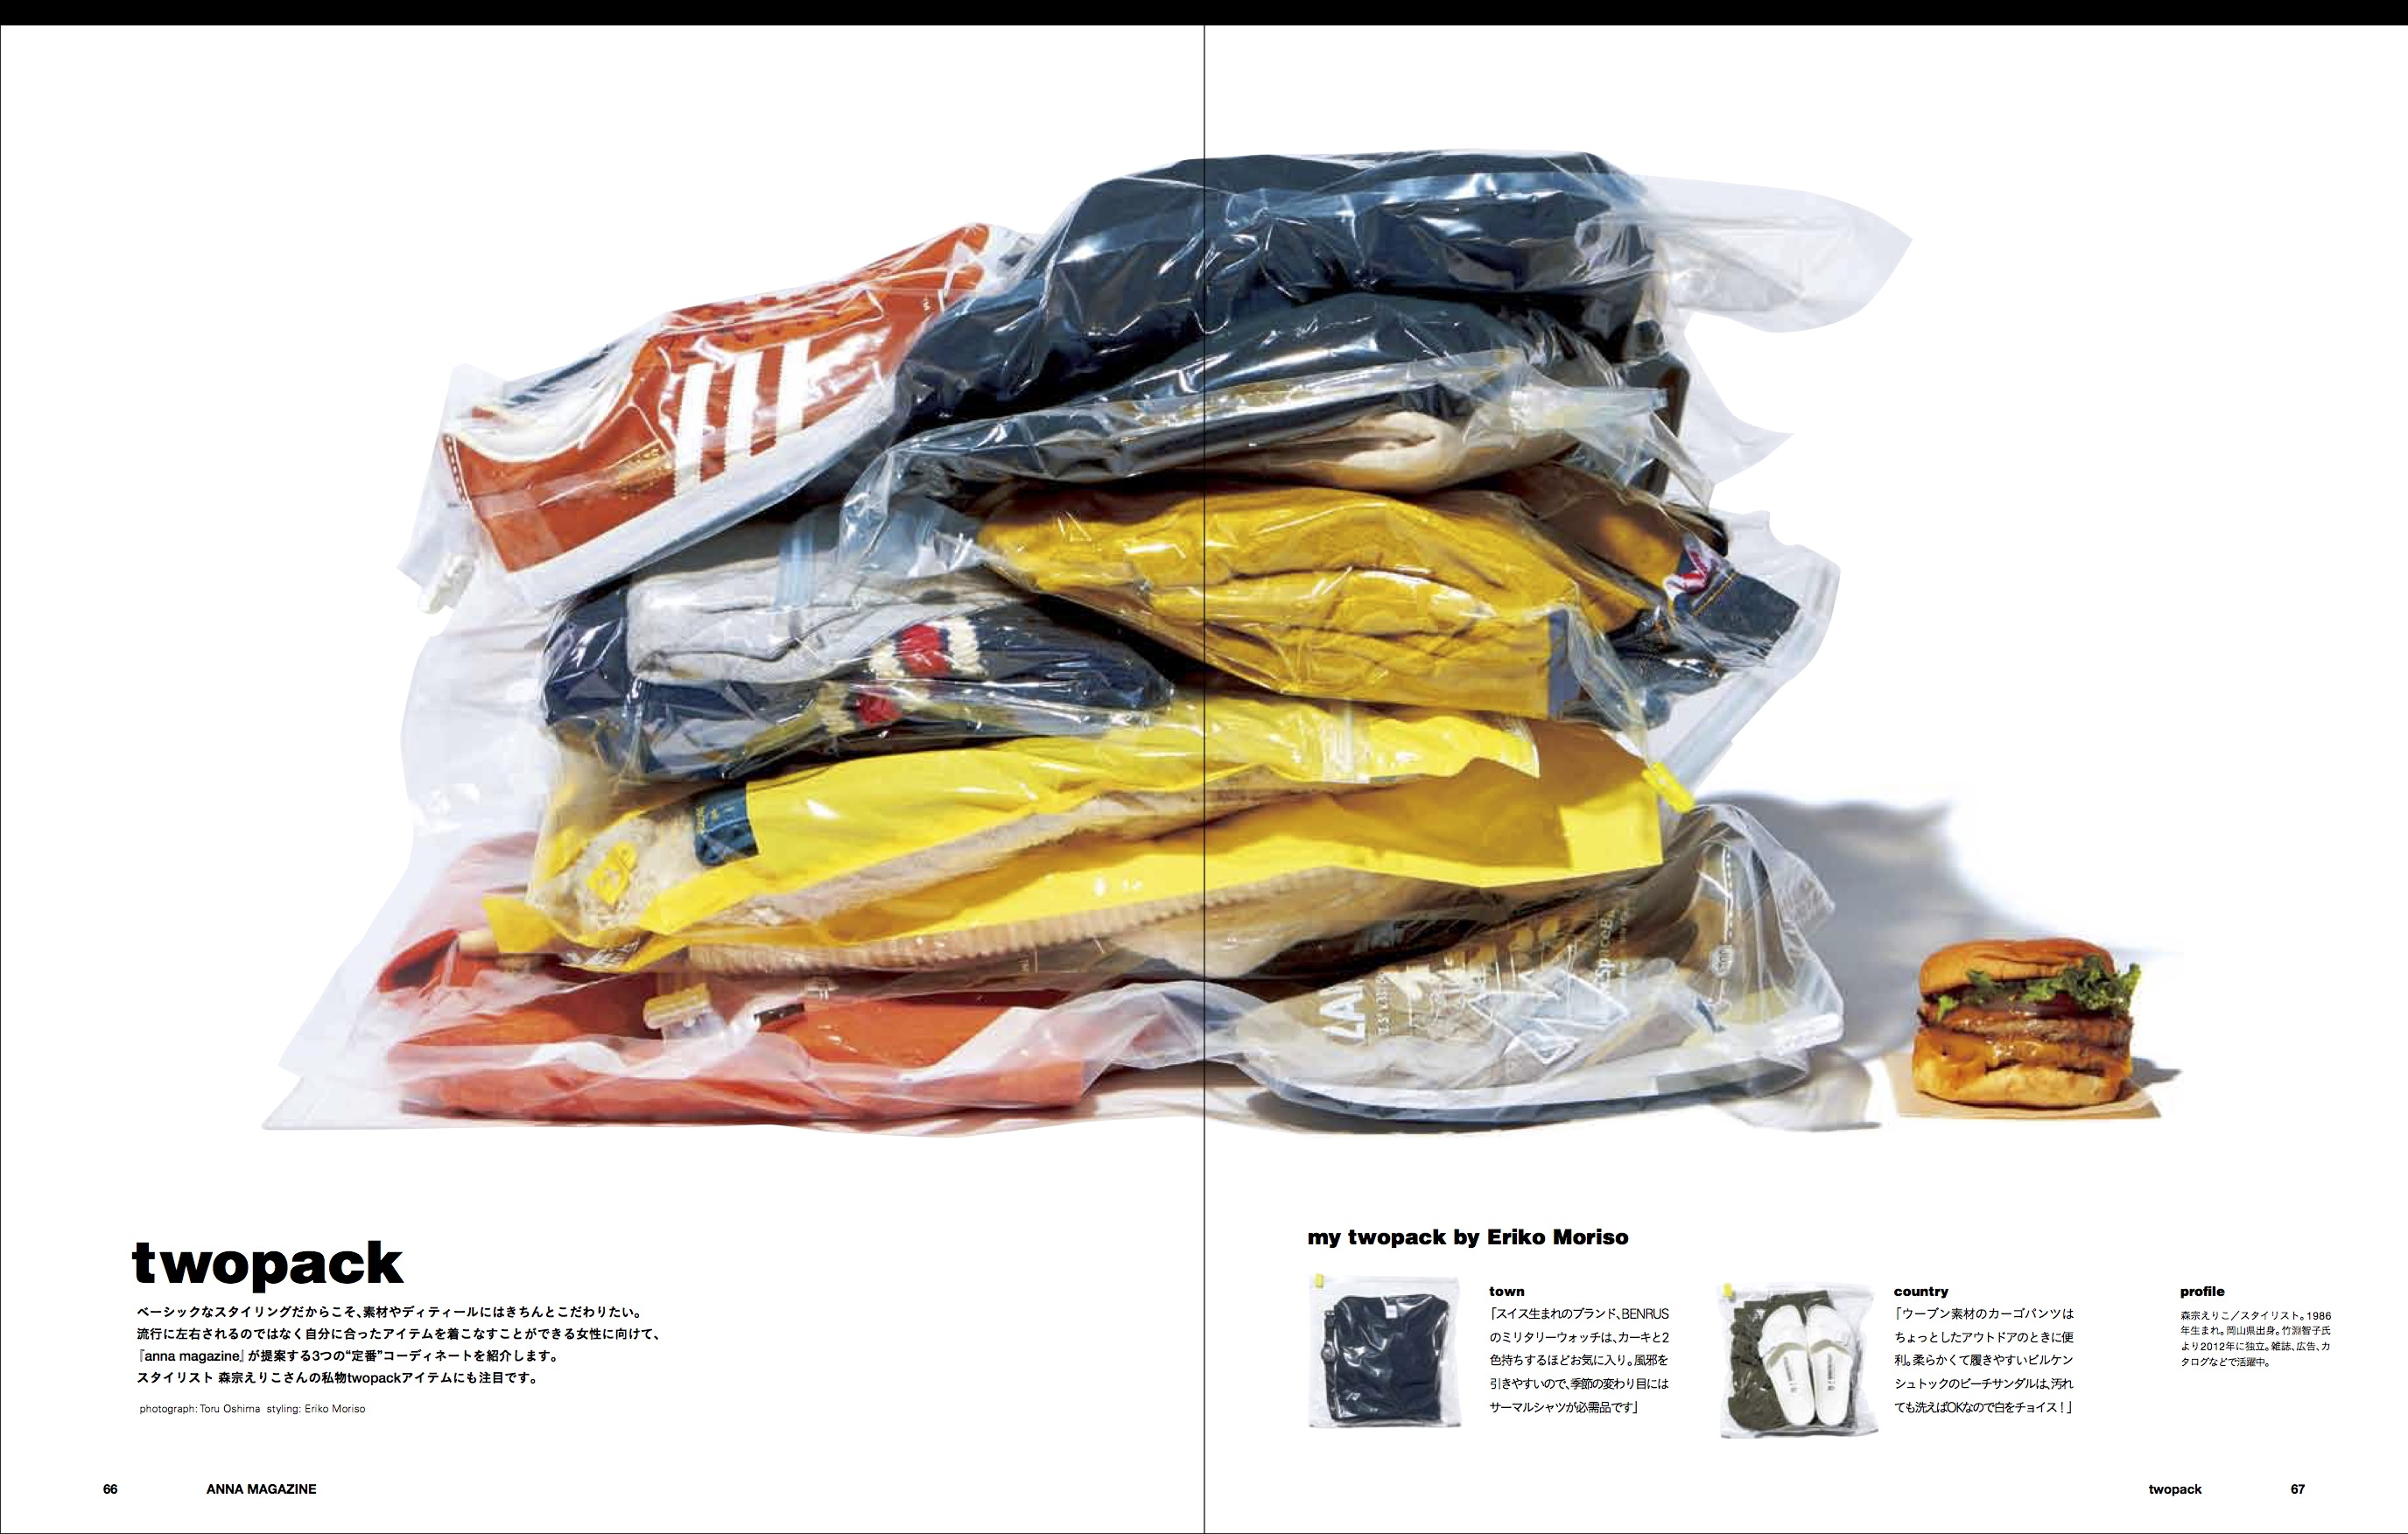 anna magazine Vol.4 P19